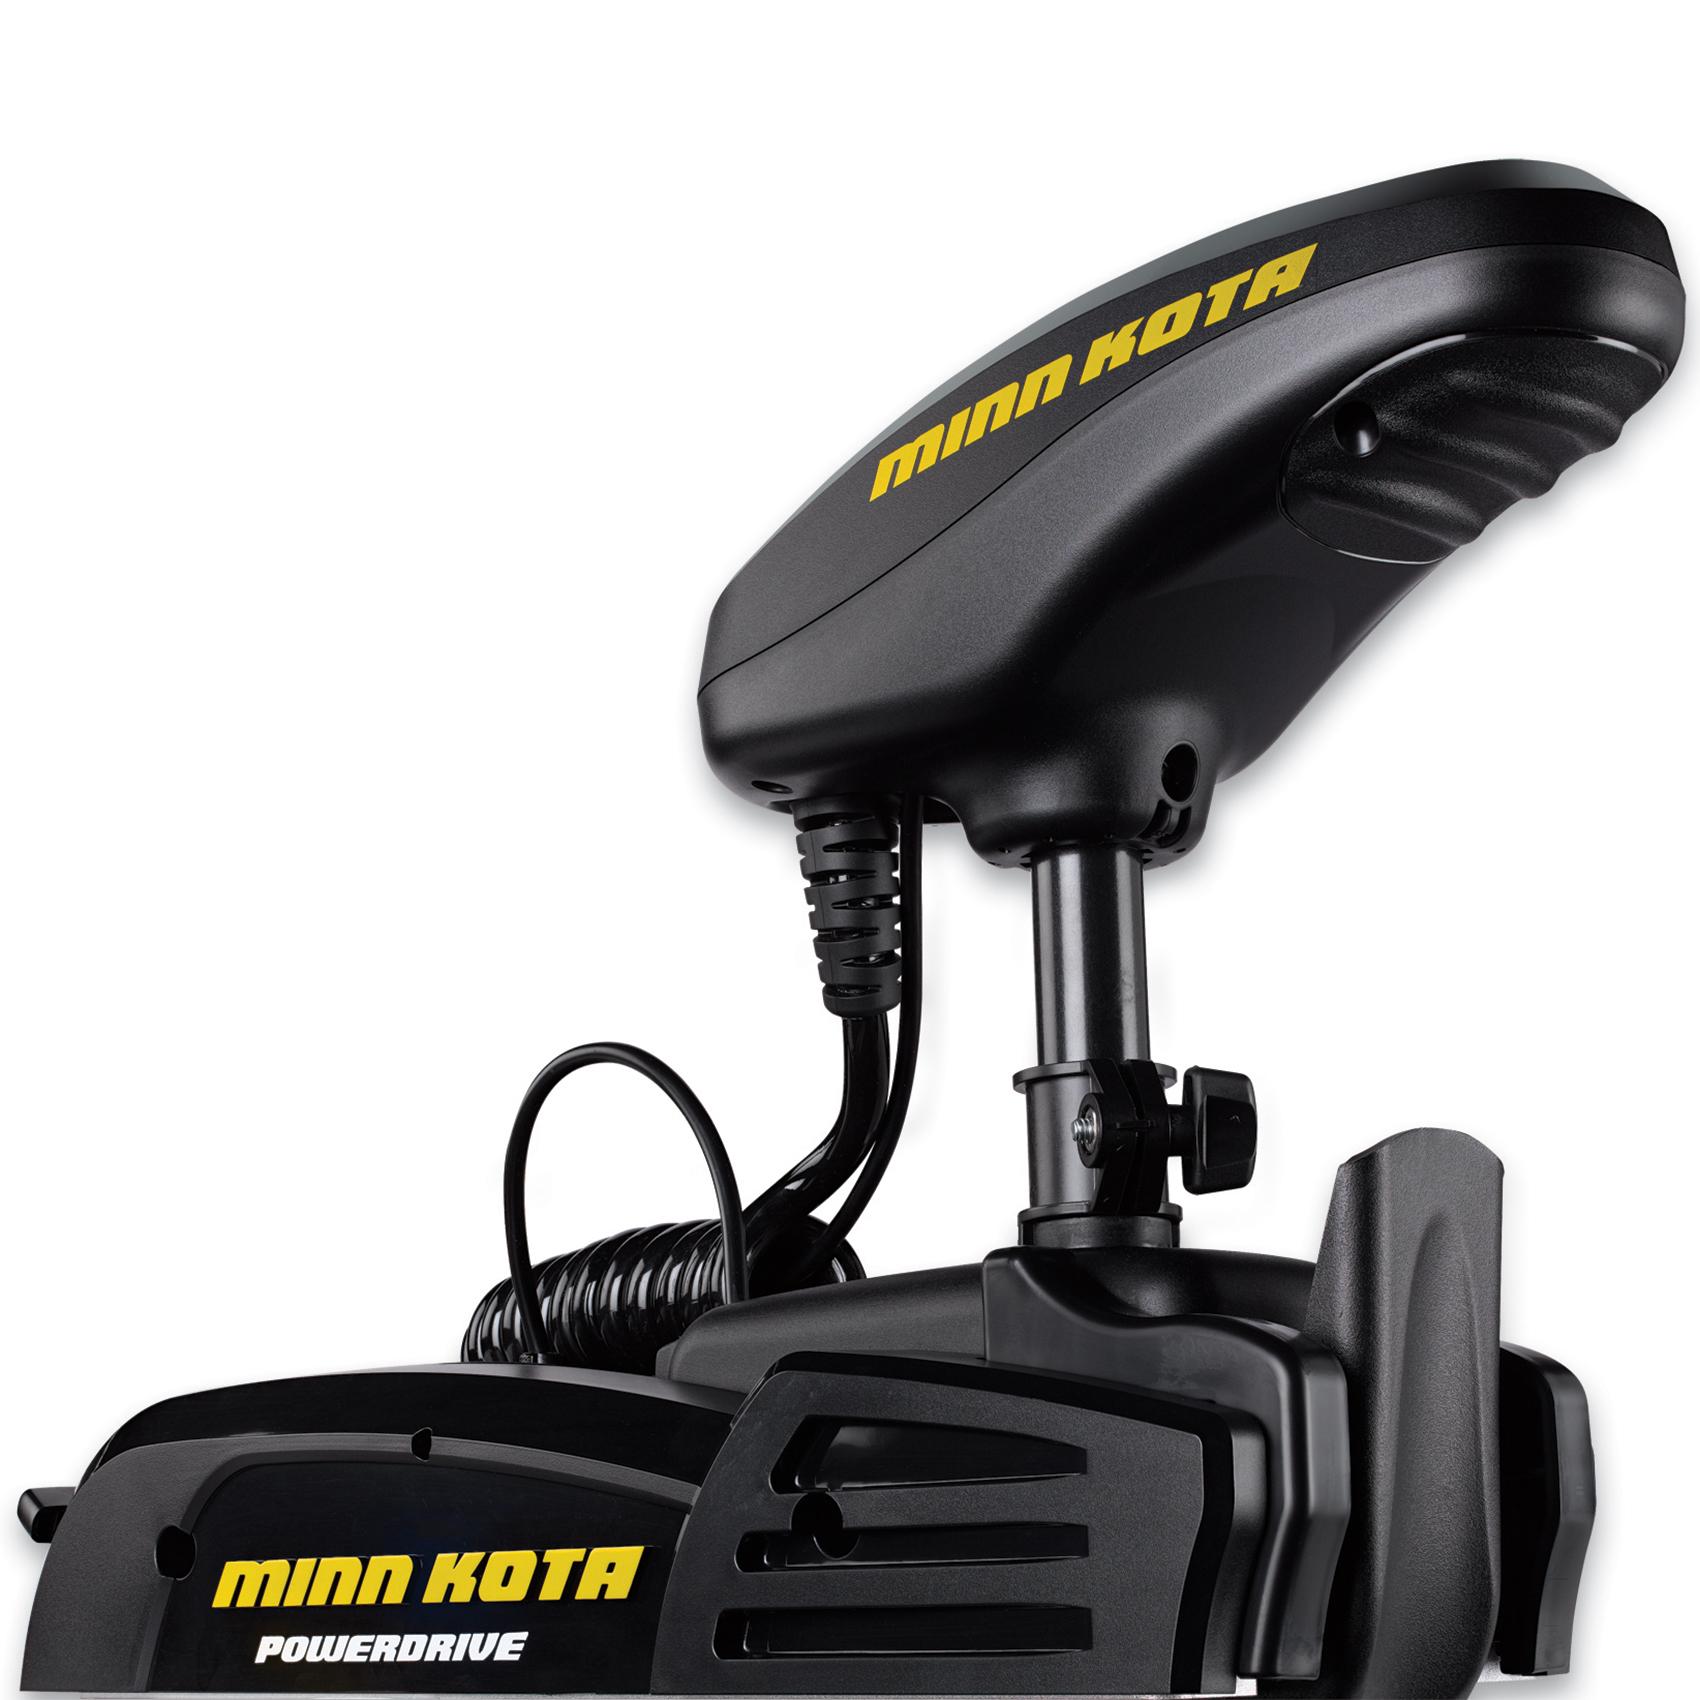 Minn Kota PowerDrive i-Pilot Bluetooth US2 Freshwater Bow Trolling Motor